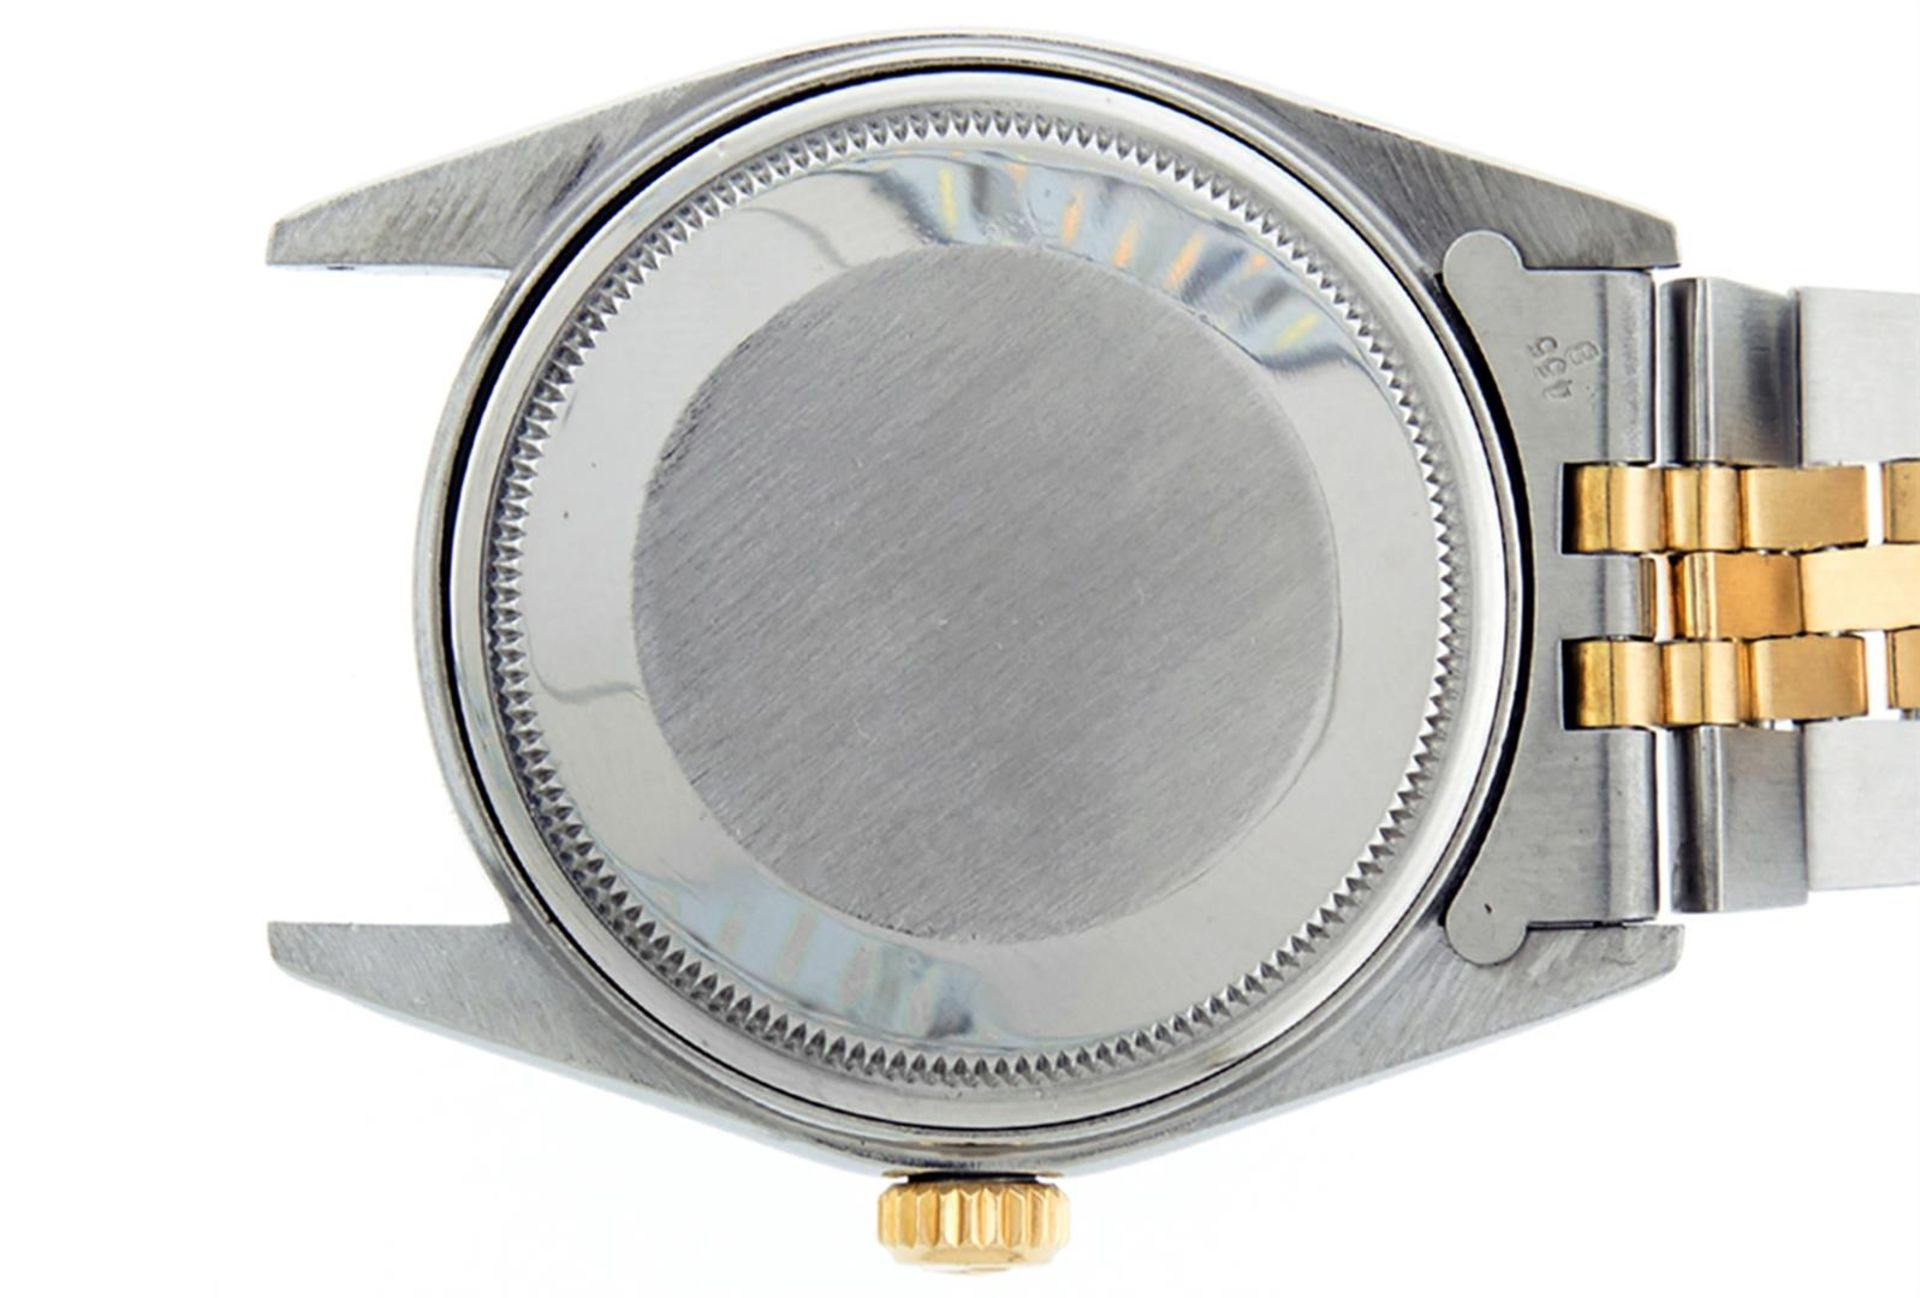 Rolex Mens 2 Tone MOP Diamond 36MM Datejust Wristwatch - Image 7 of 7